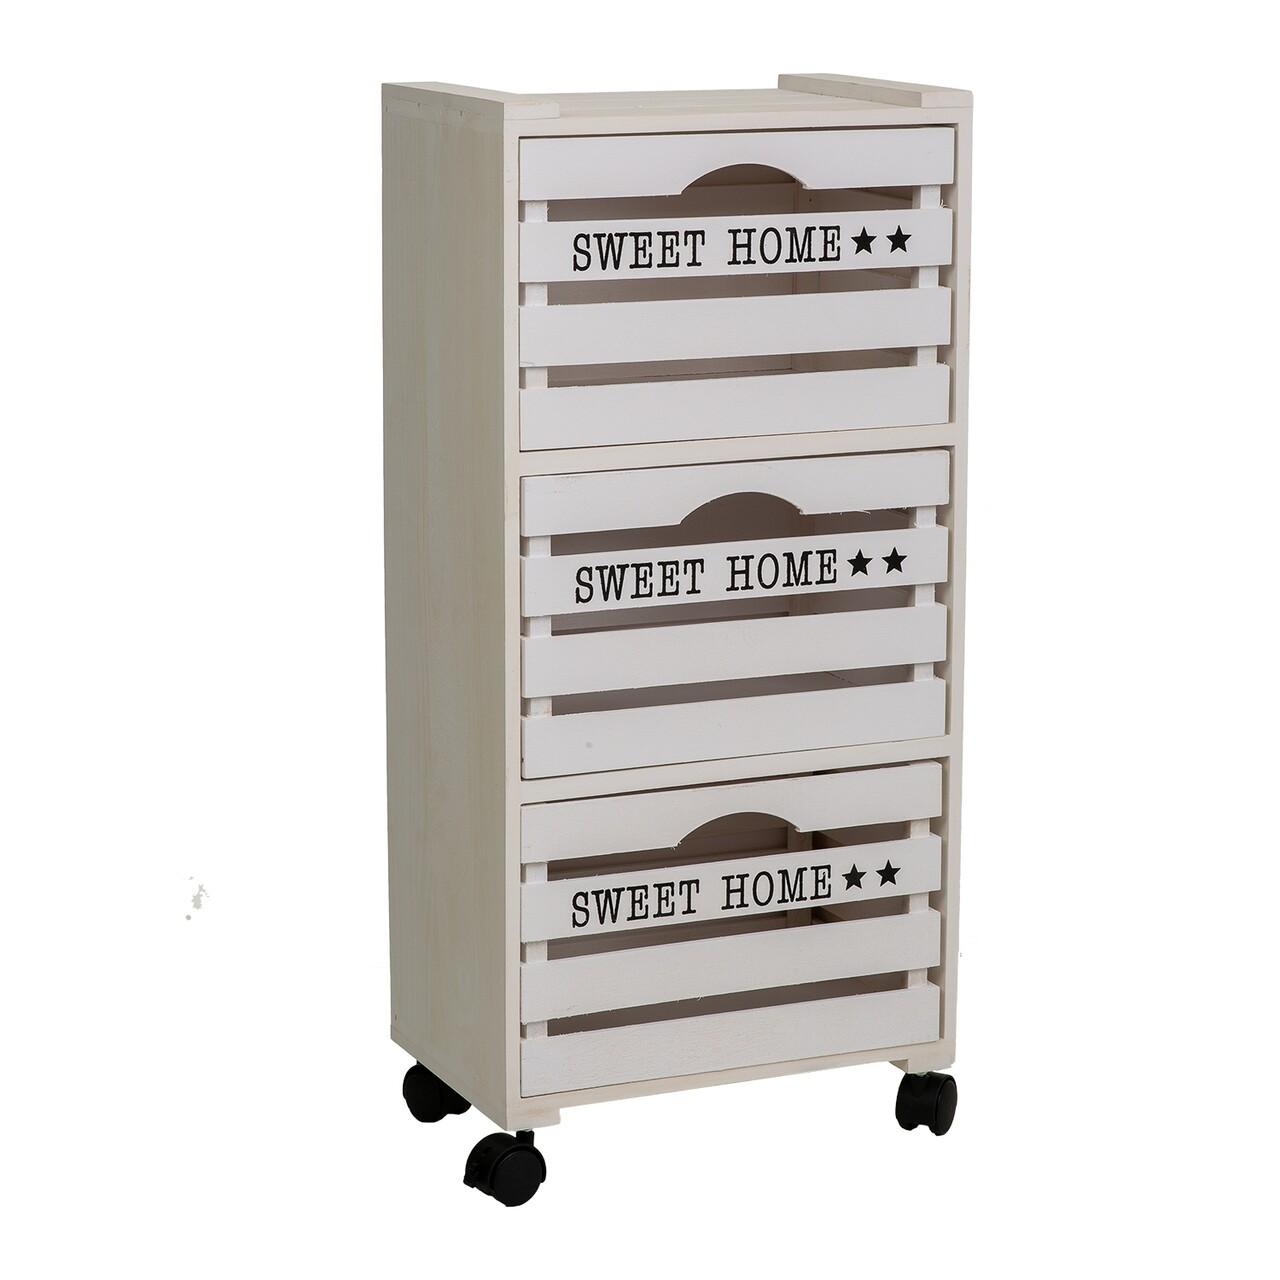 Comoda cu 4 sertare si roti, Sweet Home, Creaciones Meng, 23x35x75.5 cm, lemn de paulownia, alb